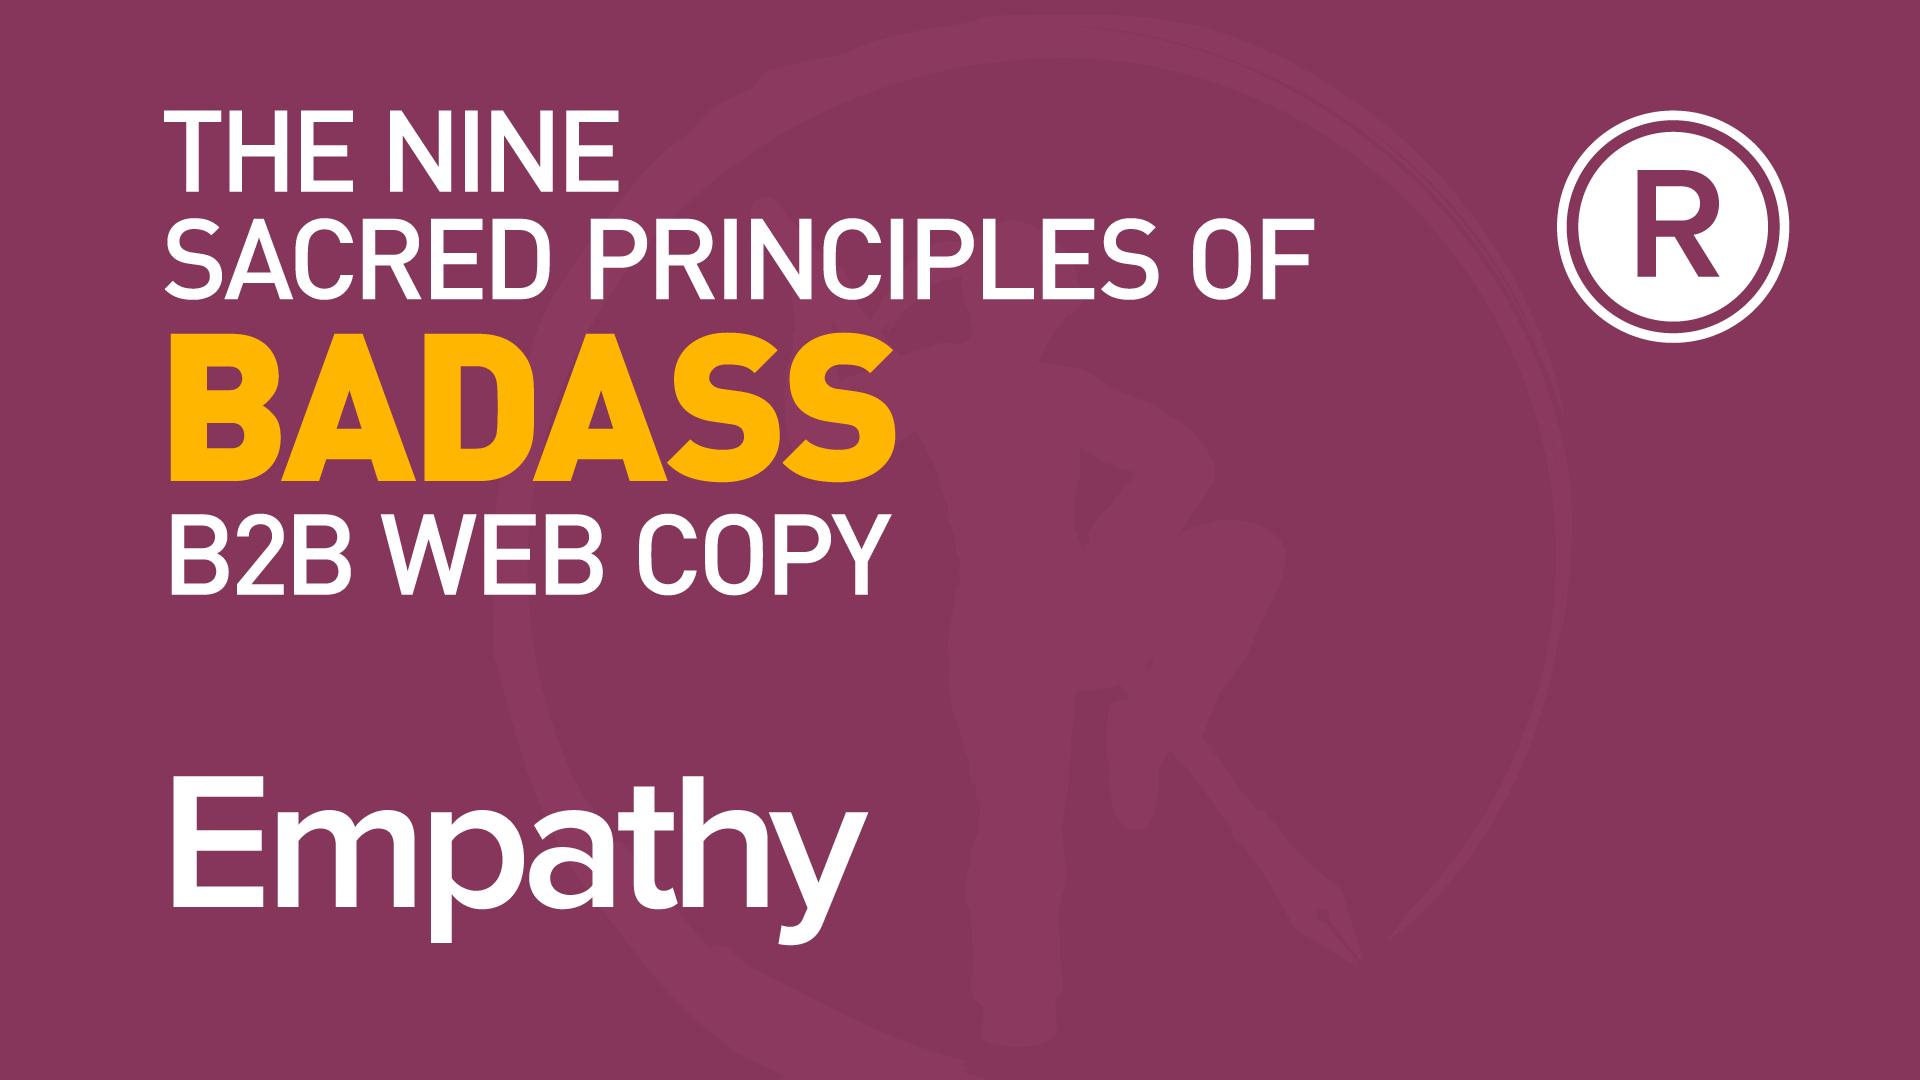 5th principle of badass B2B web copy: Empathy